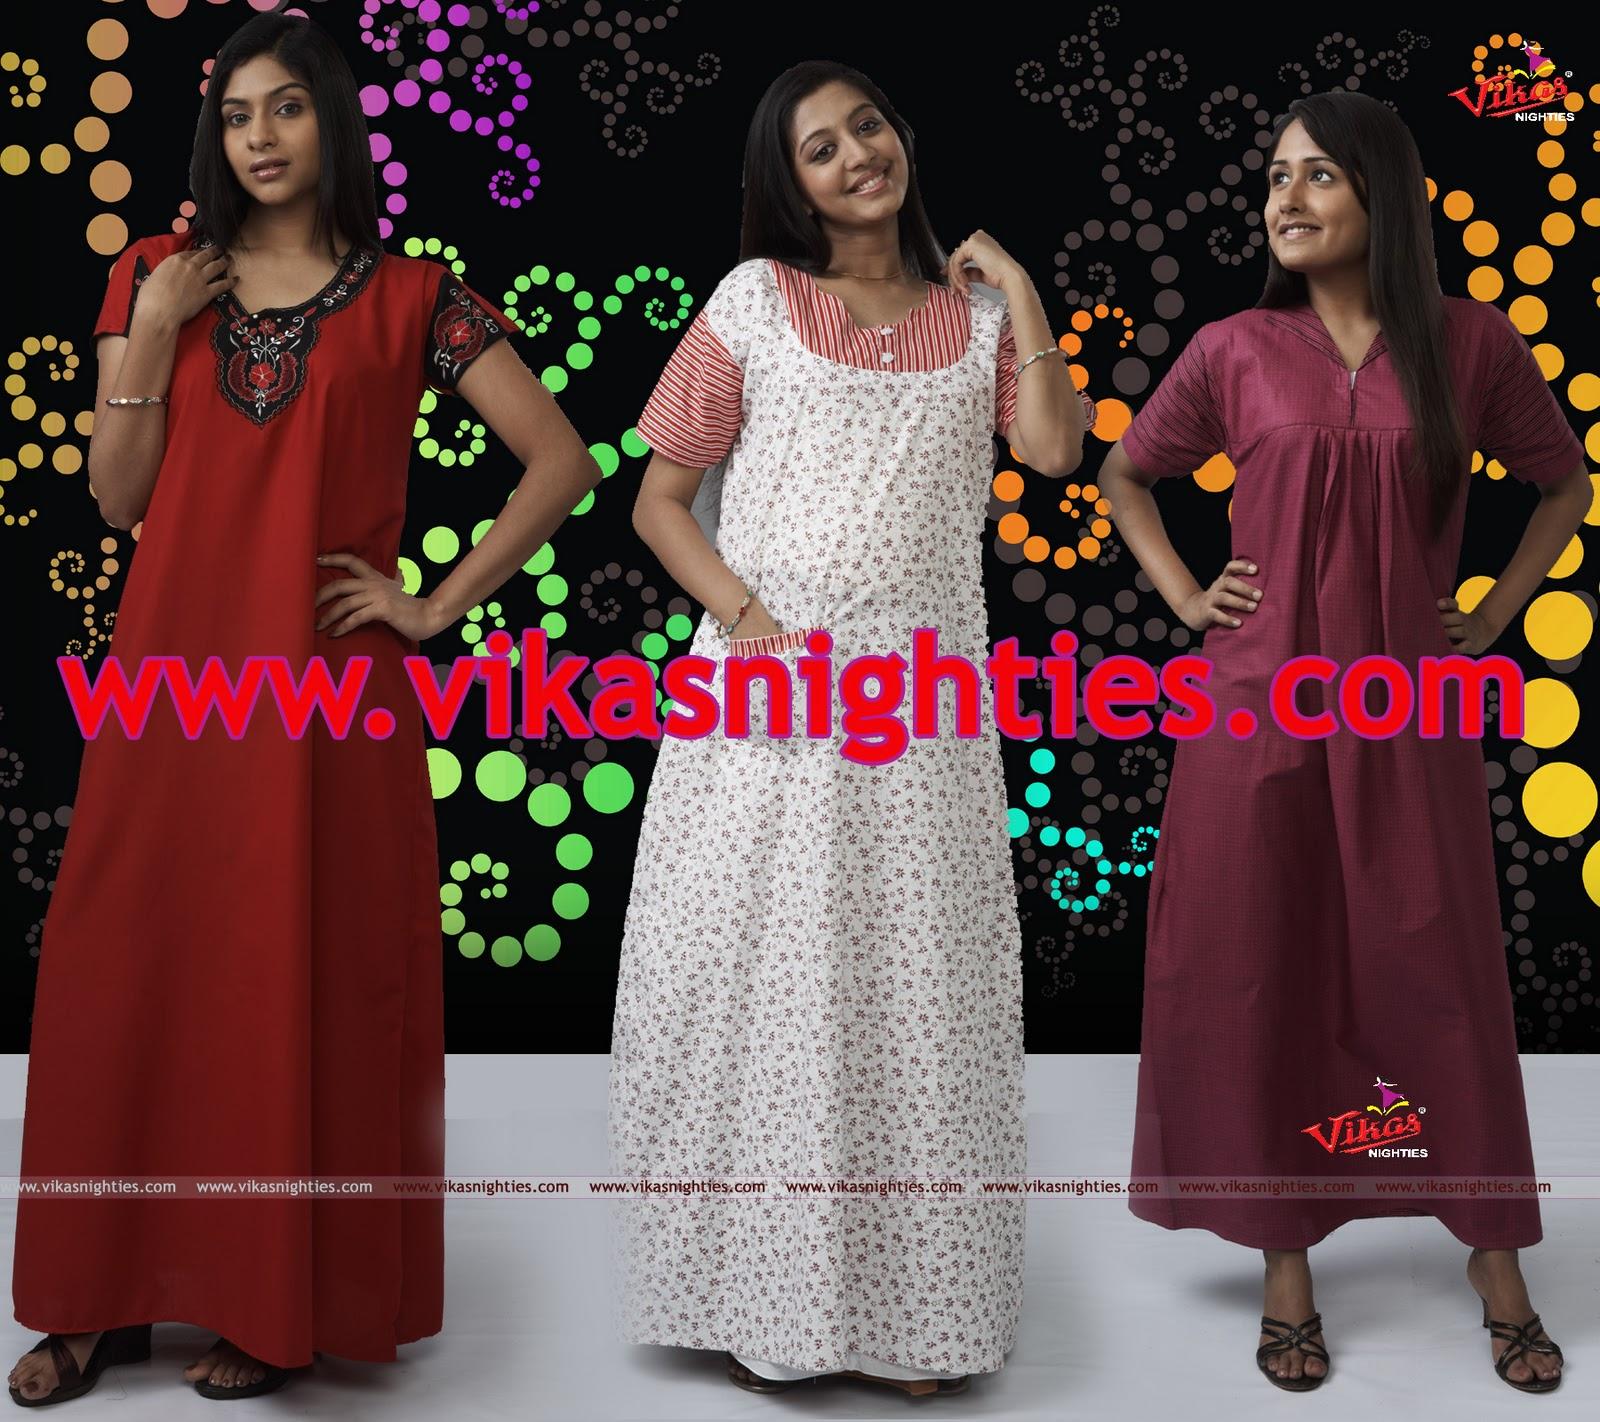 37375c4d8f vikas fashions  Vikas nighties photos